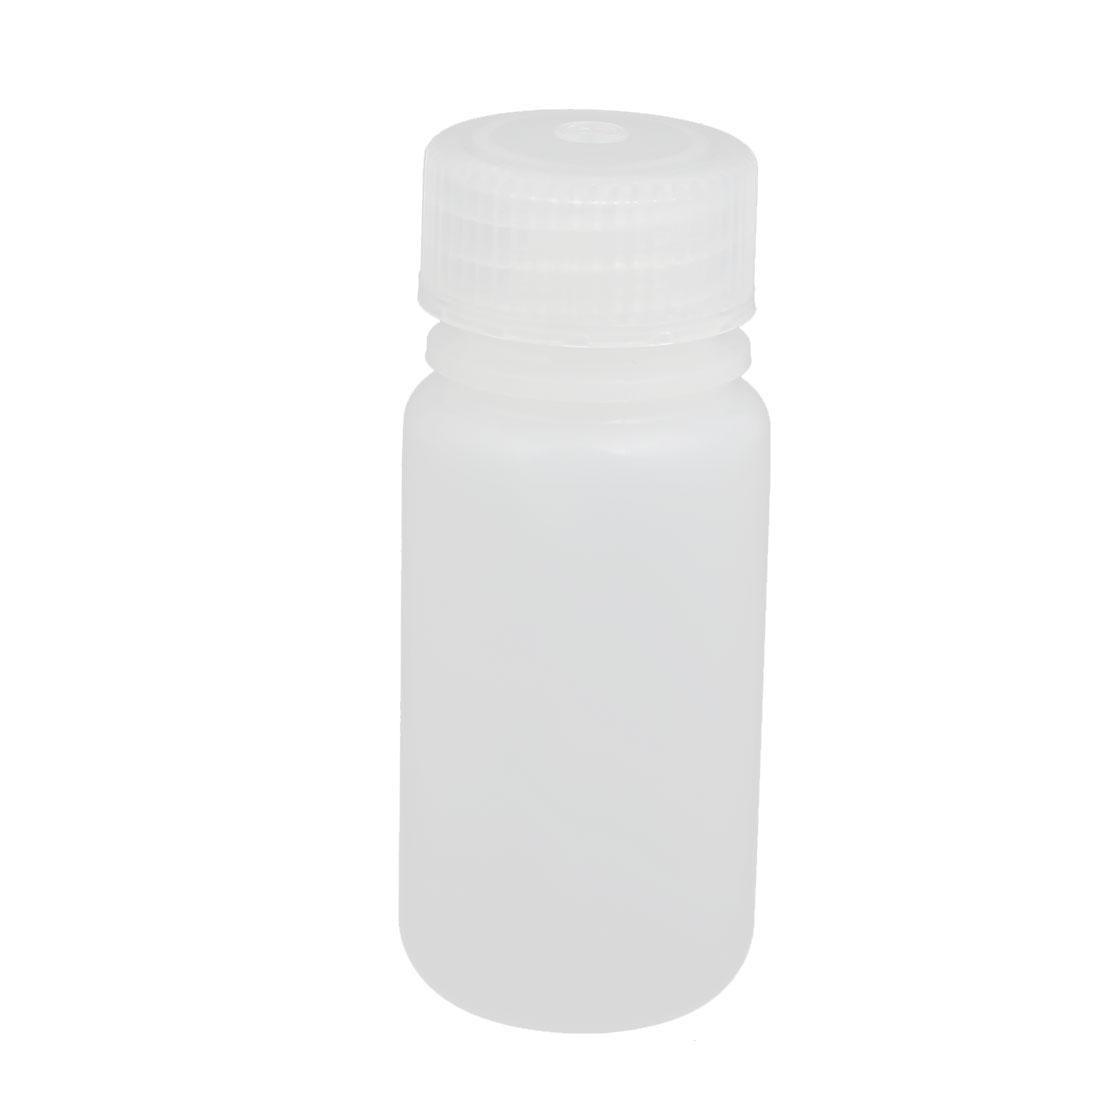 50ml Plastic Round Laboratory Reagent Bottle Sample Thicken Bottle White